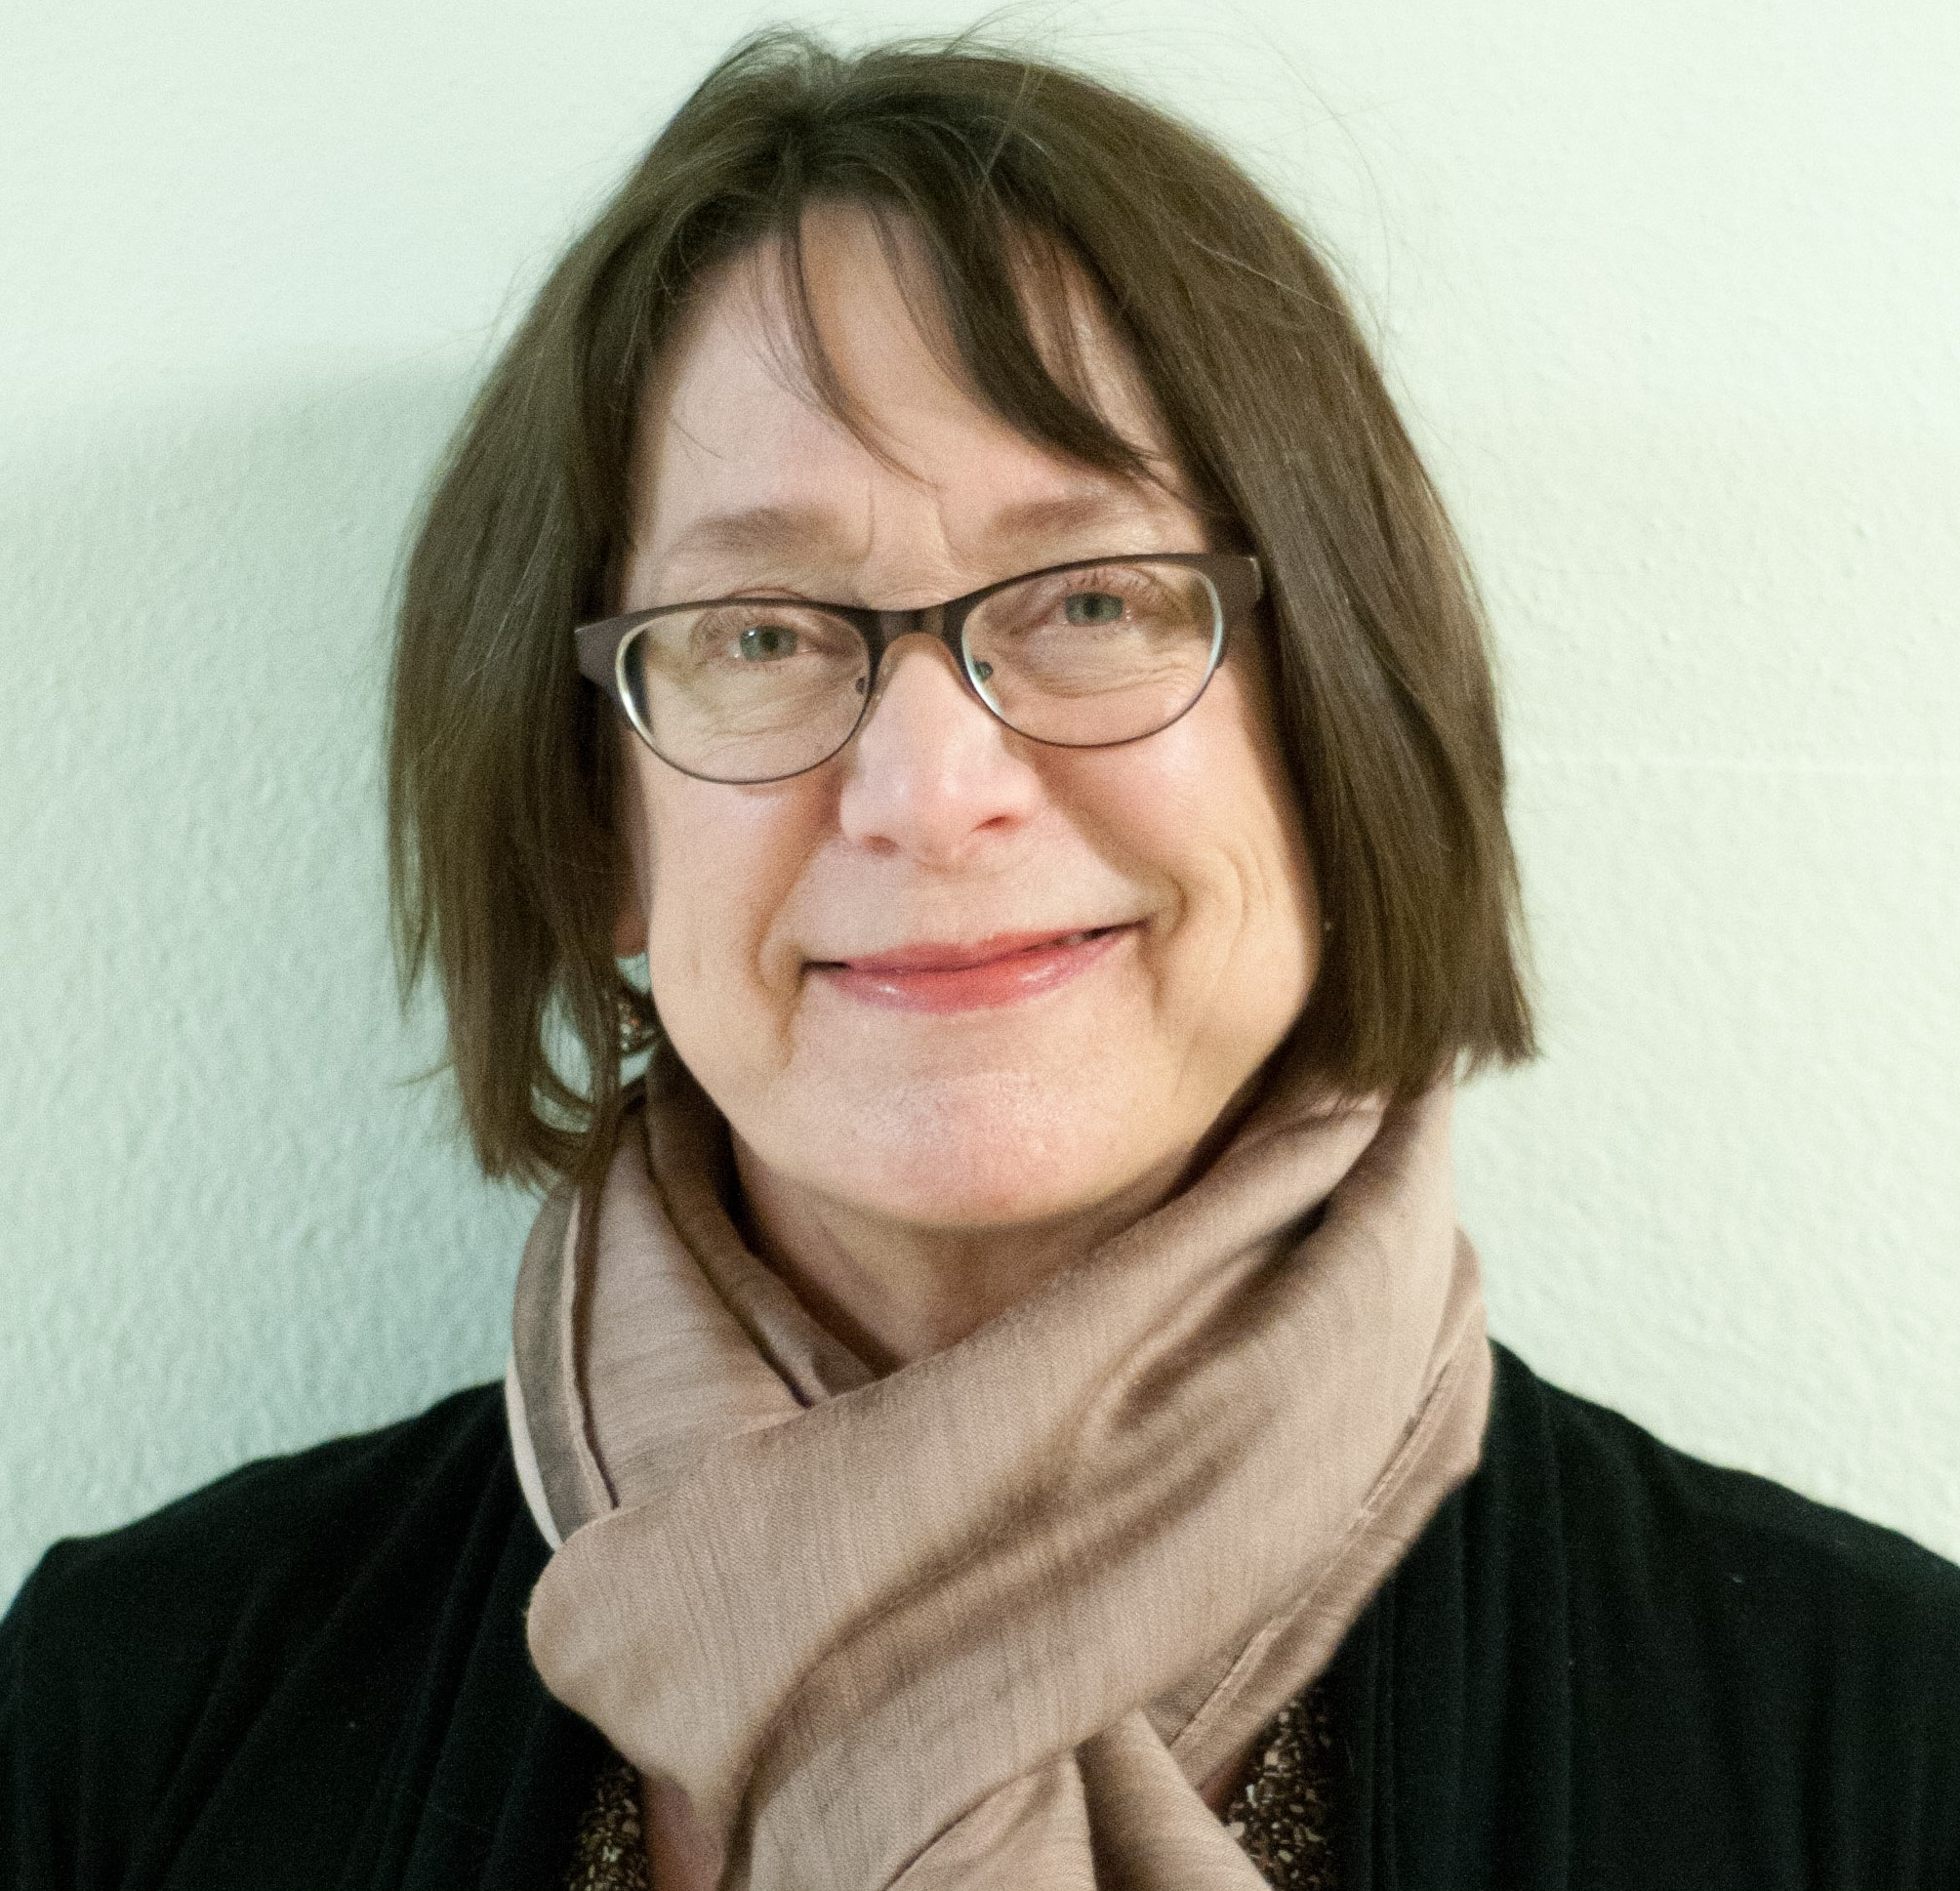 Chere Weiss